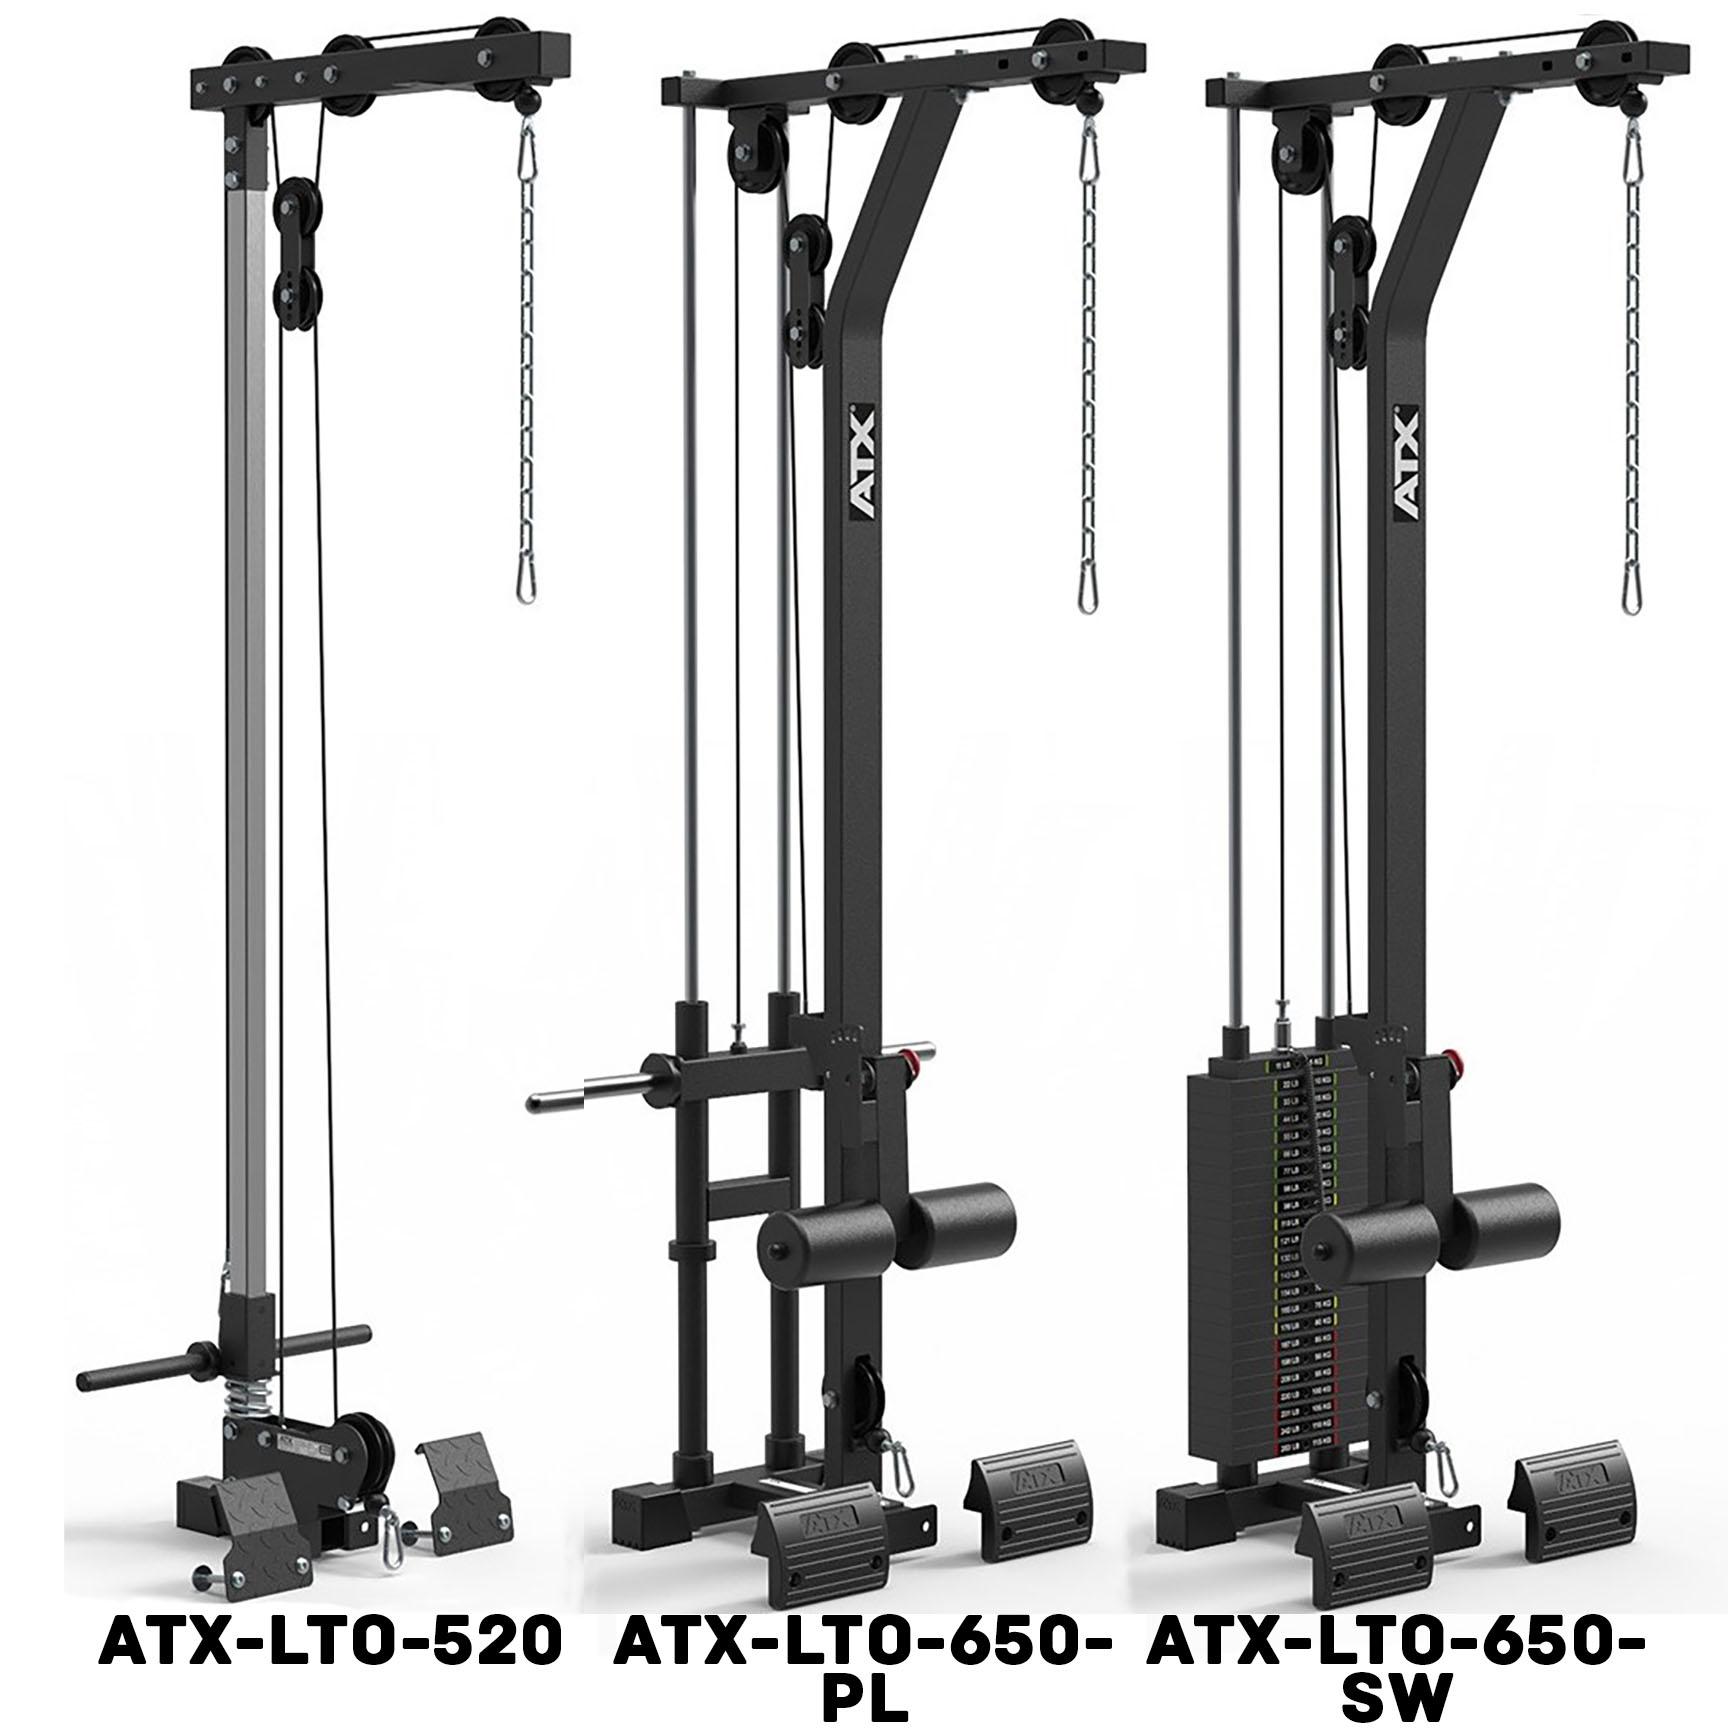 atx rack systems